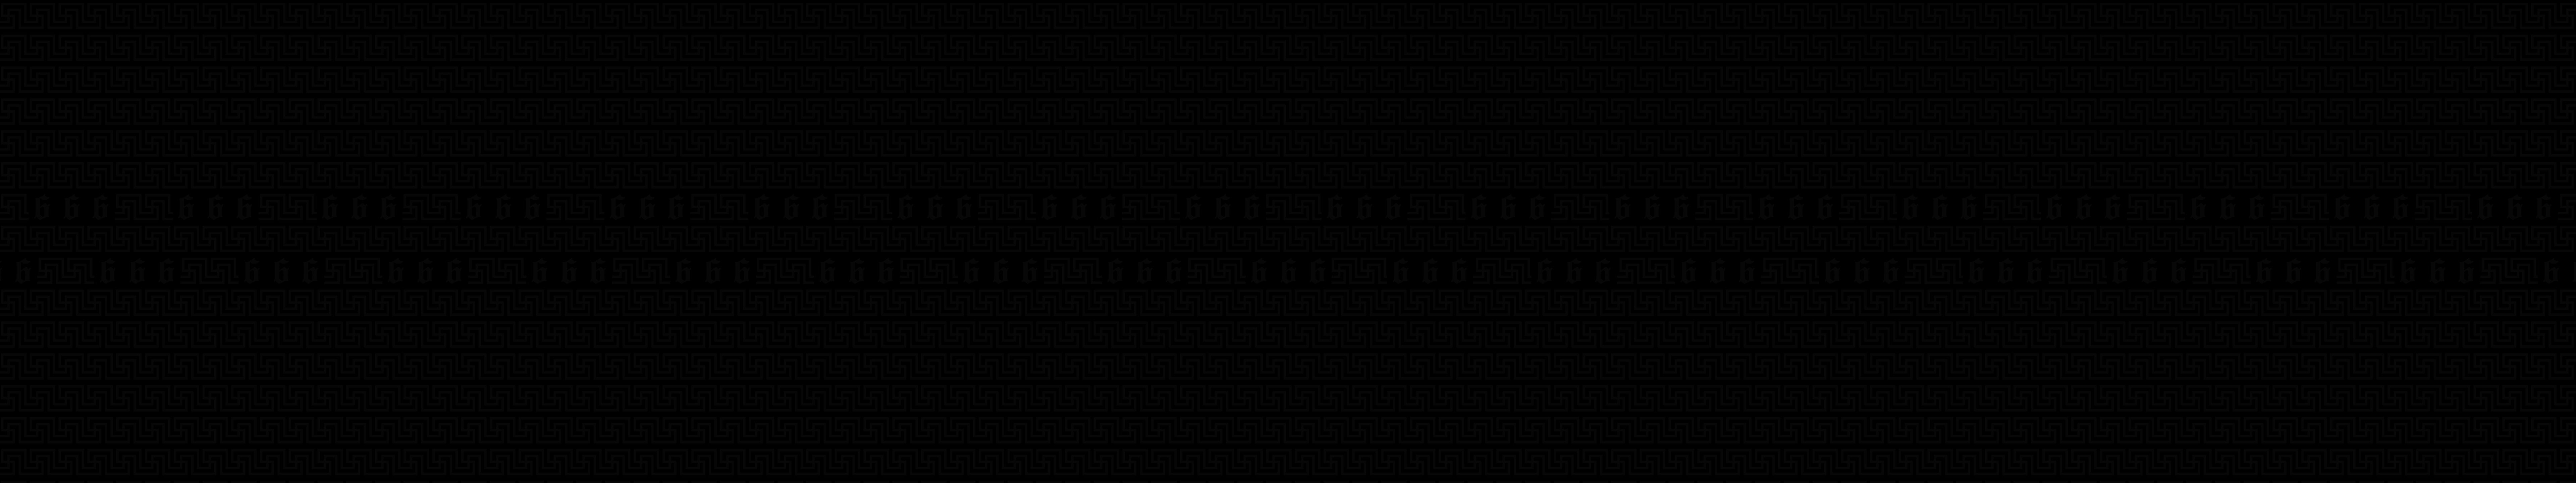 Wallpaper Pattern Black Background Minimalism Triple